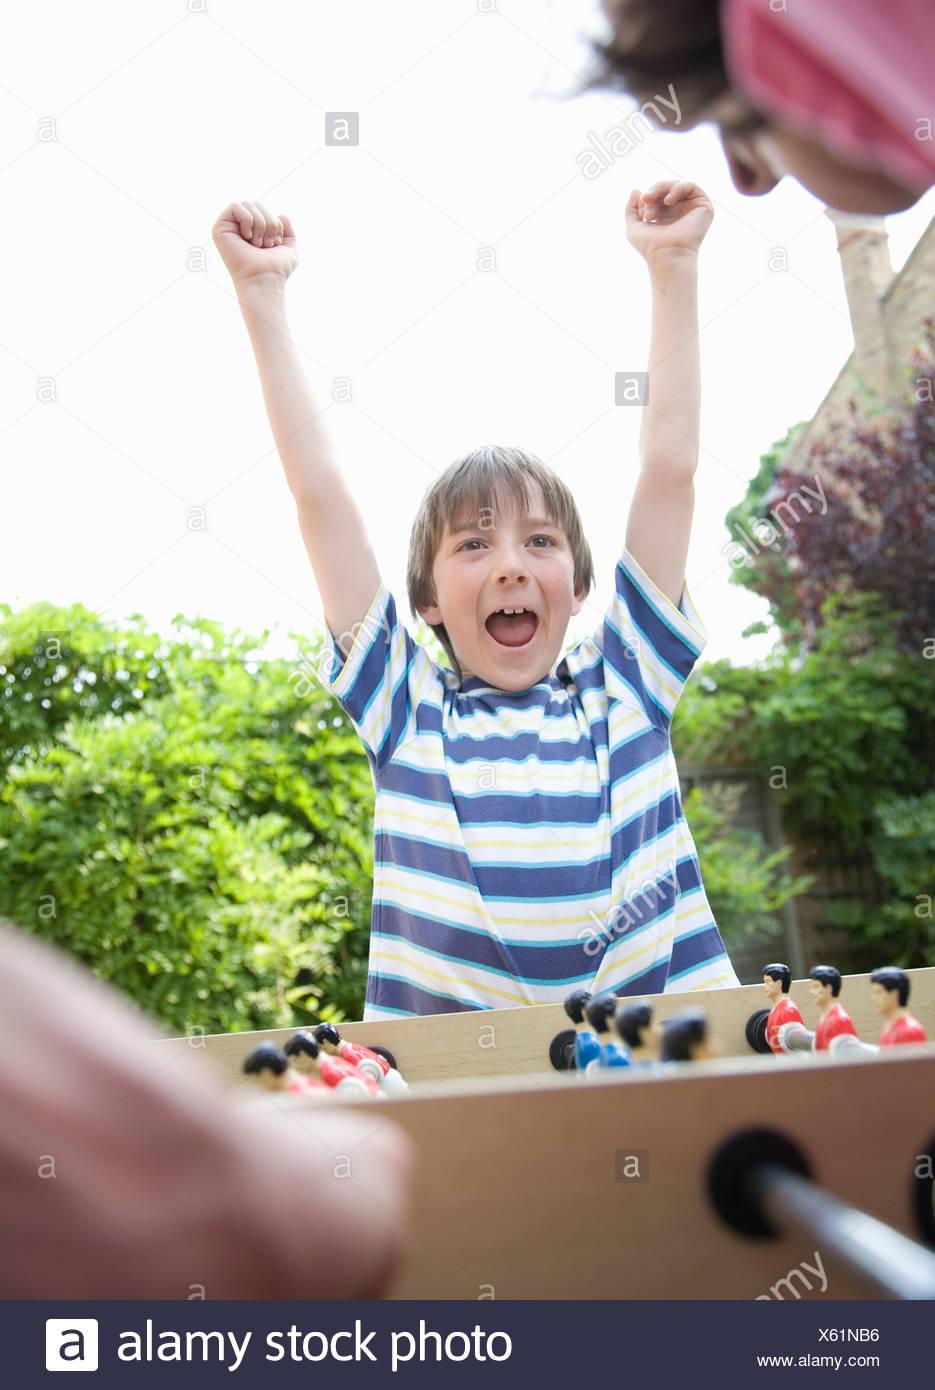 Boy celebrating, playing table football - Stock Image